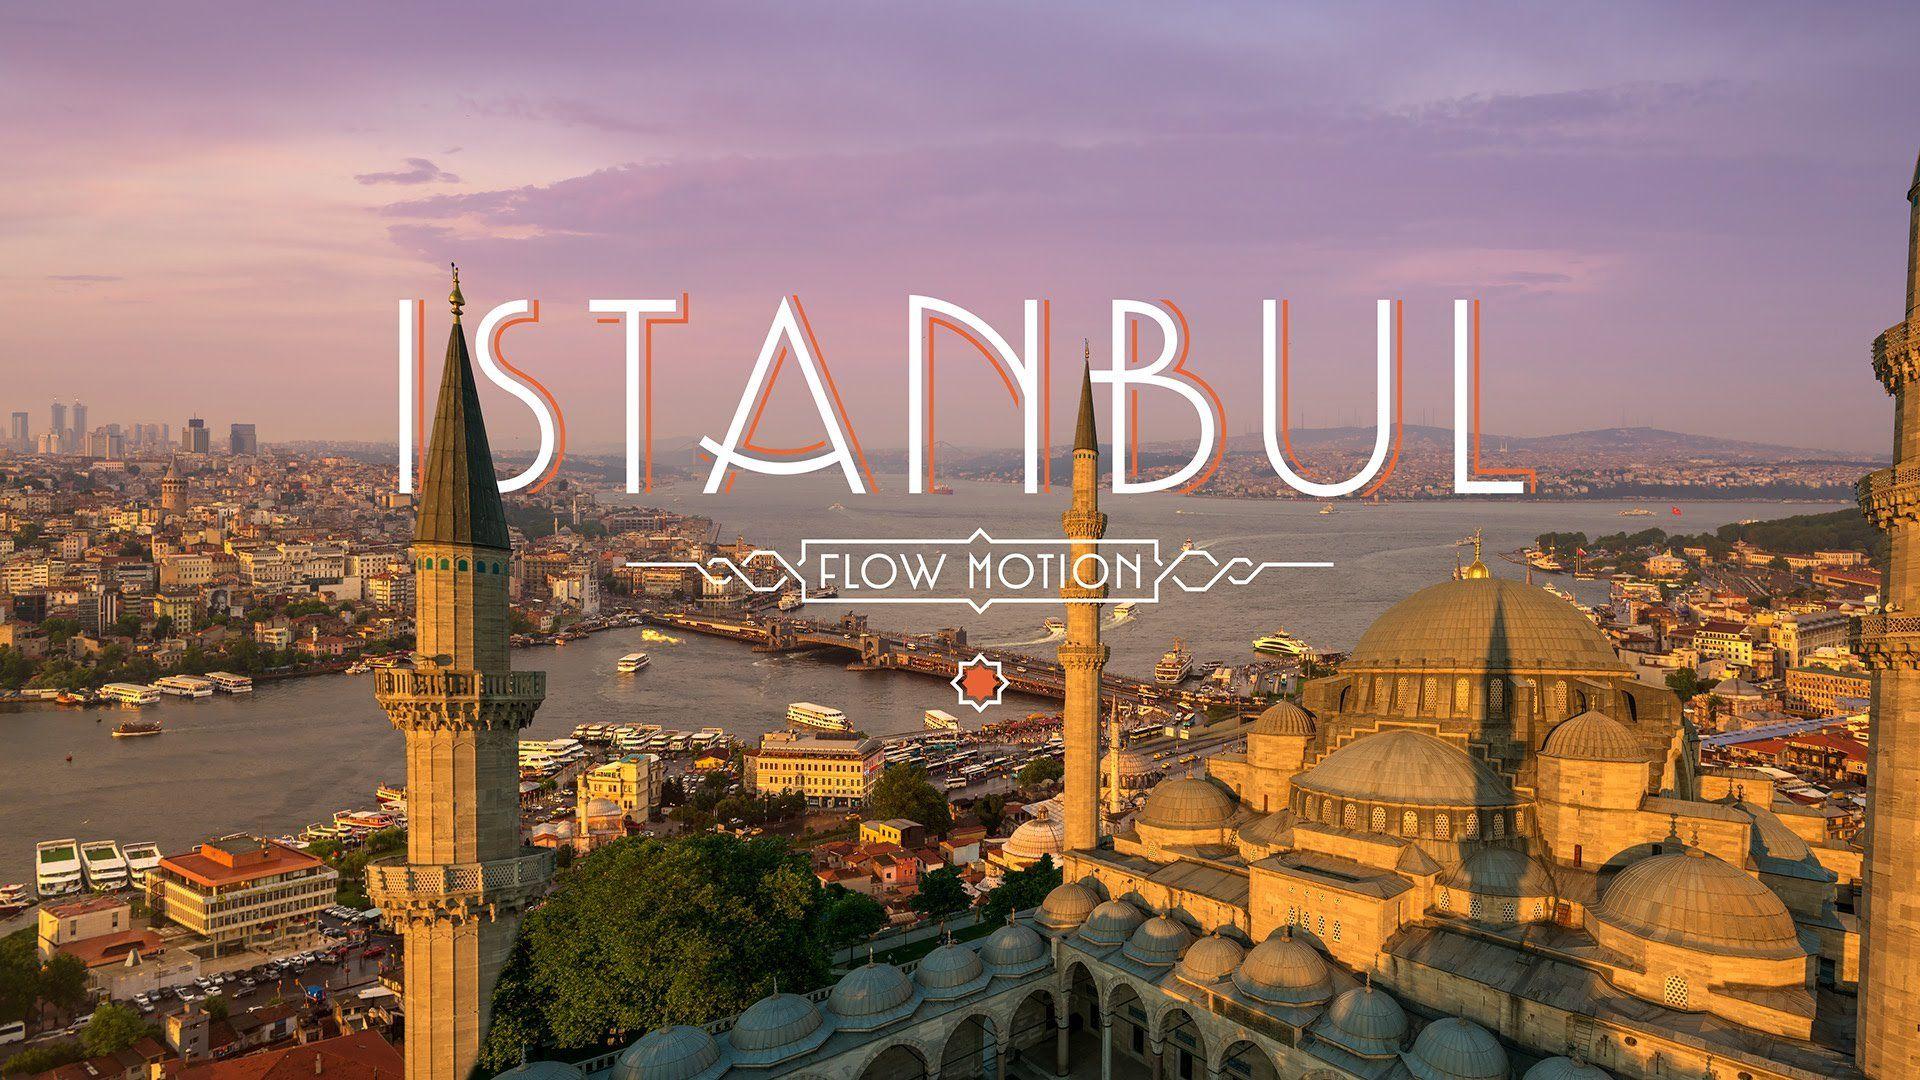 Istanbul Wallpaper 4k free download